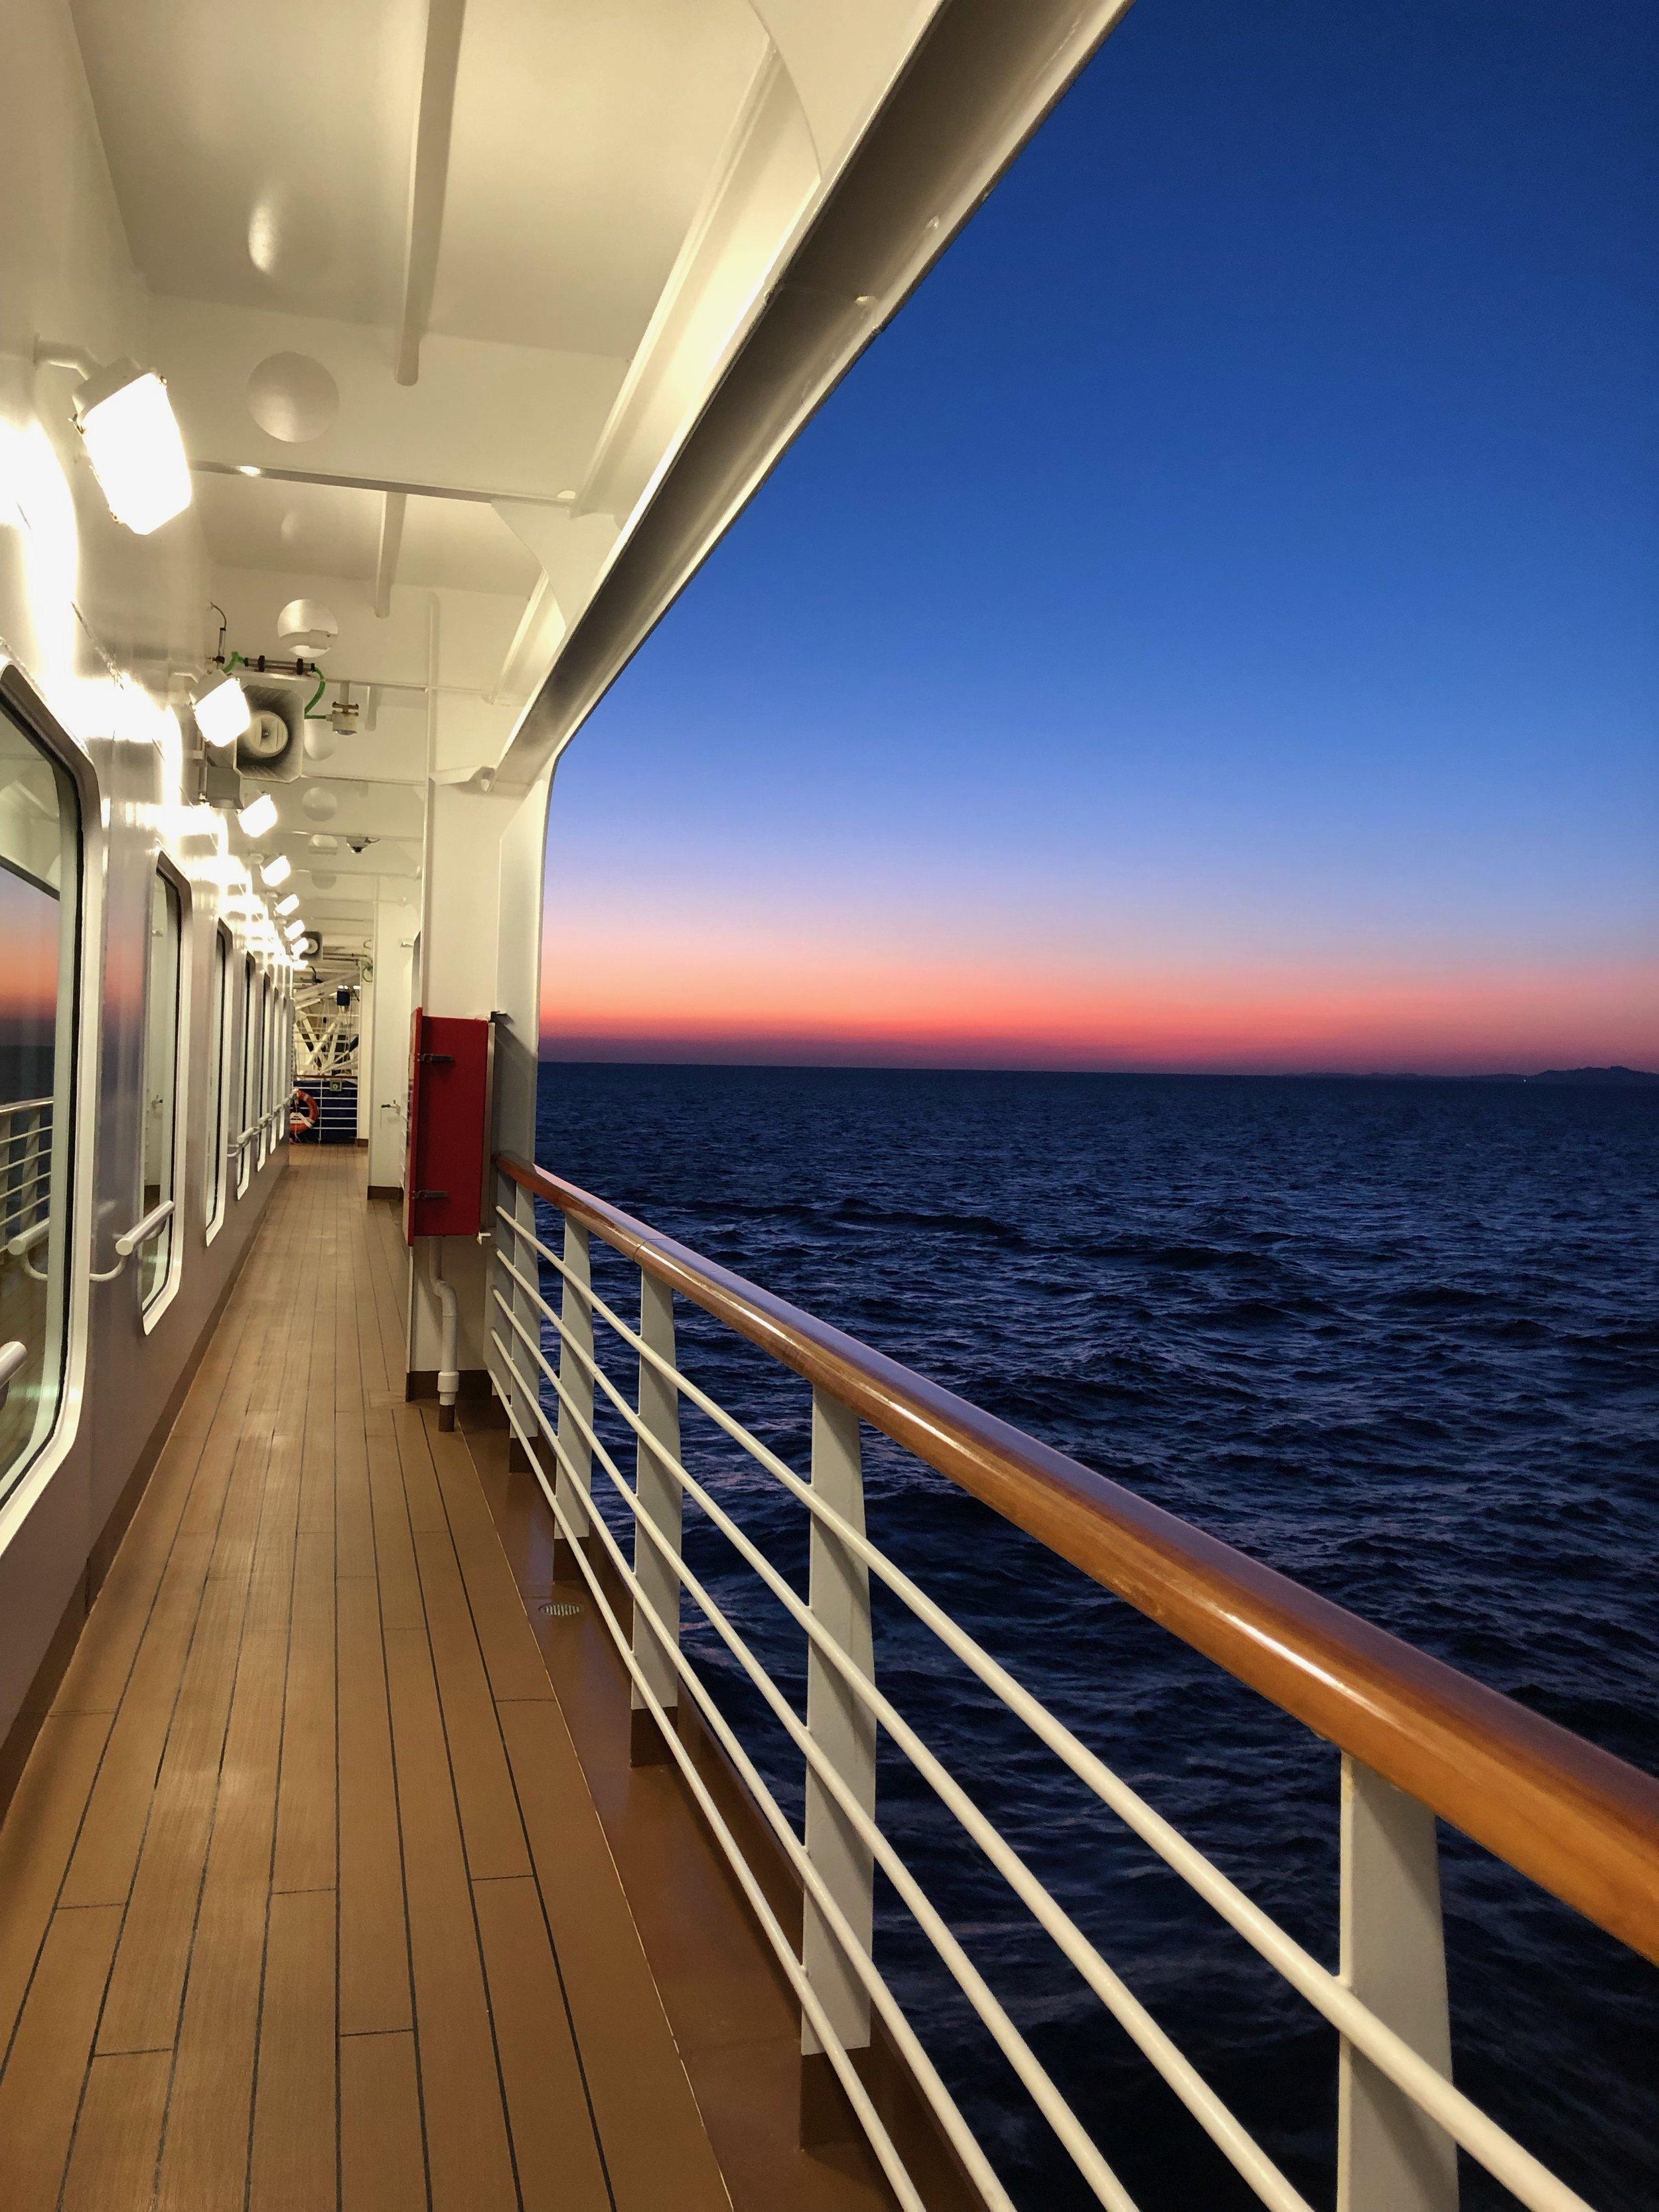 Sunset on Deck 3.